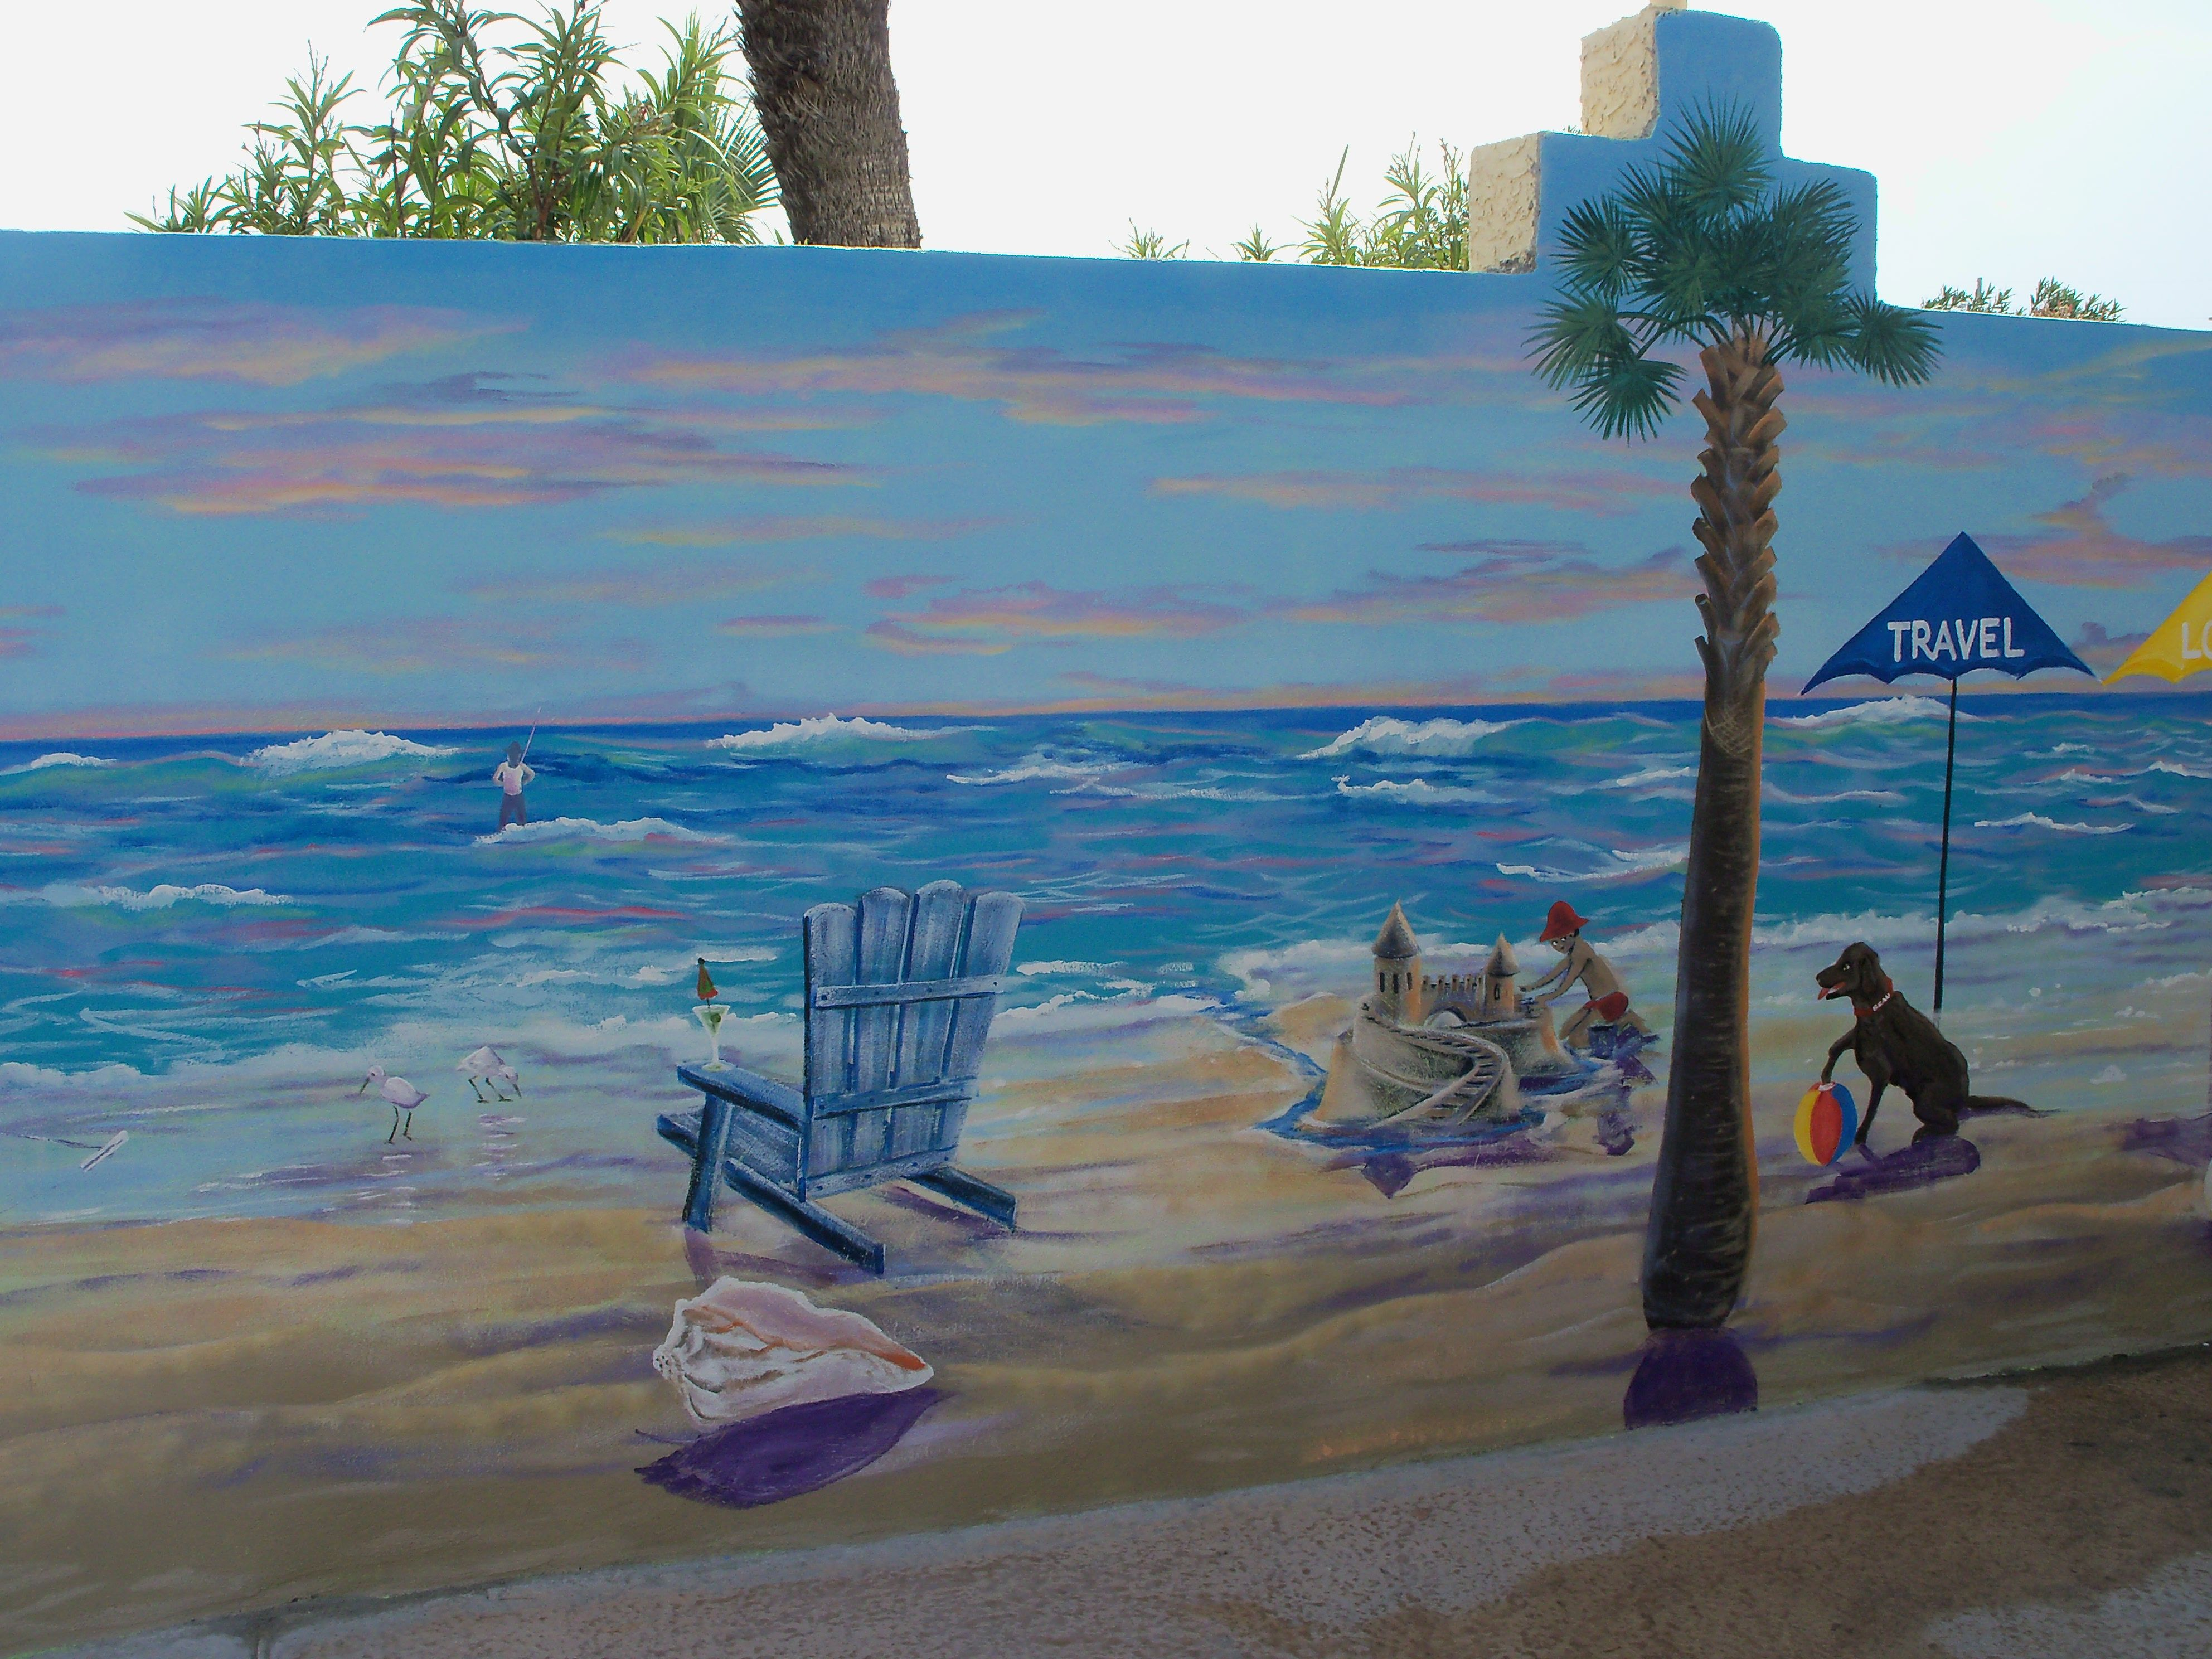 Outdoor Pool Wall Outdoor Wall Murals In 2019 Beach Wall Murals